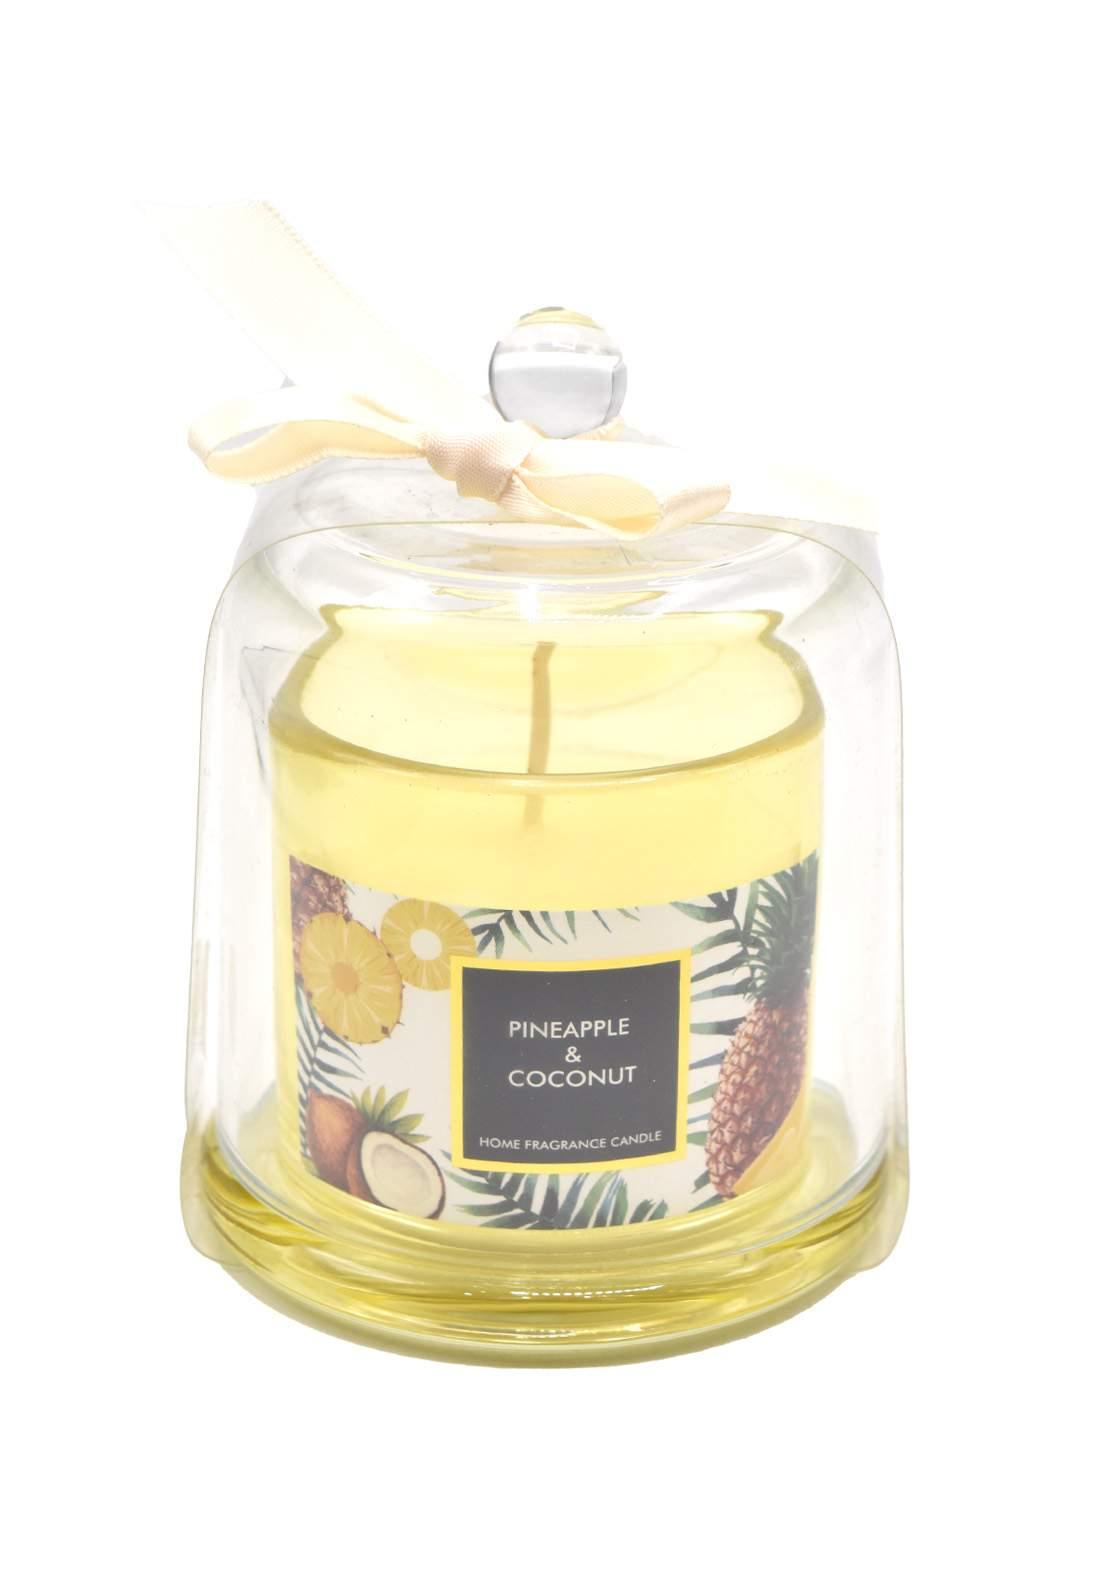 Home Fragrance Candle Pineapple and Coconut شمعة عطرية بعطر الاناناس وجوز الهند